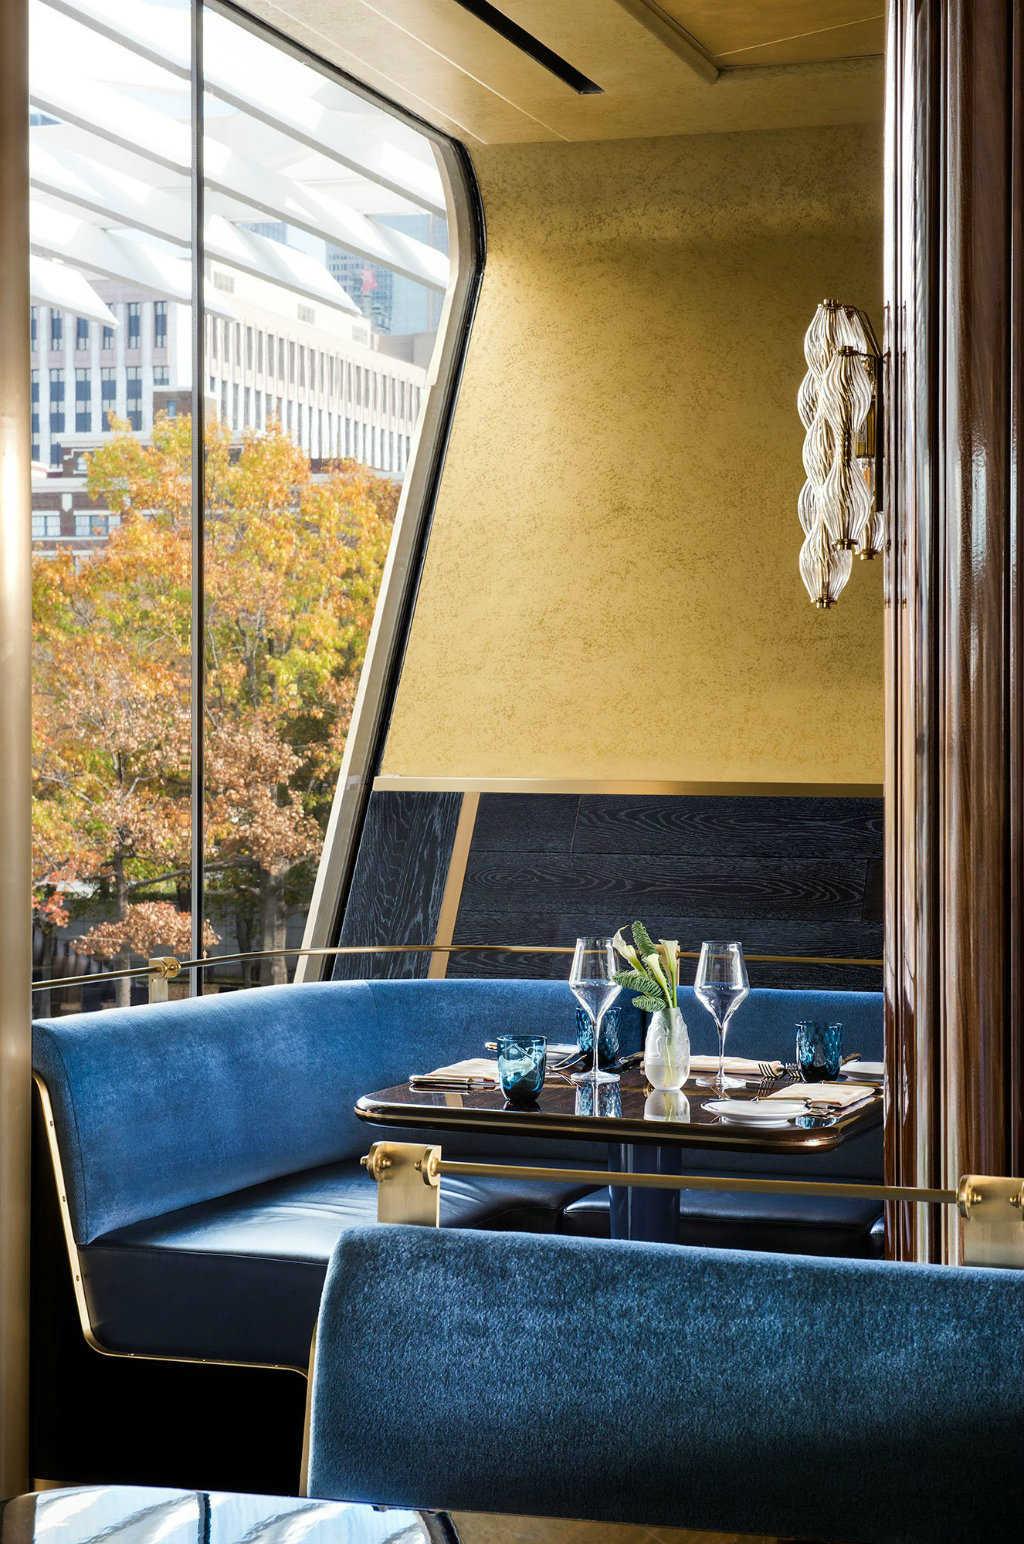 Kitchen decor ideas to use – Bullion restaurant by Martin Brudnizki ...